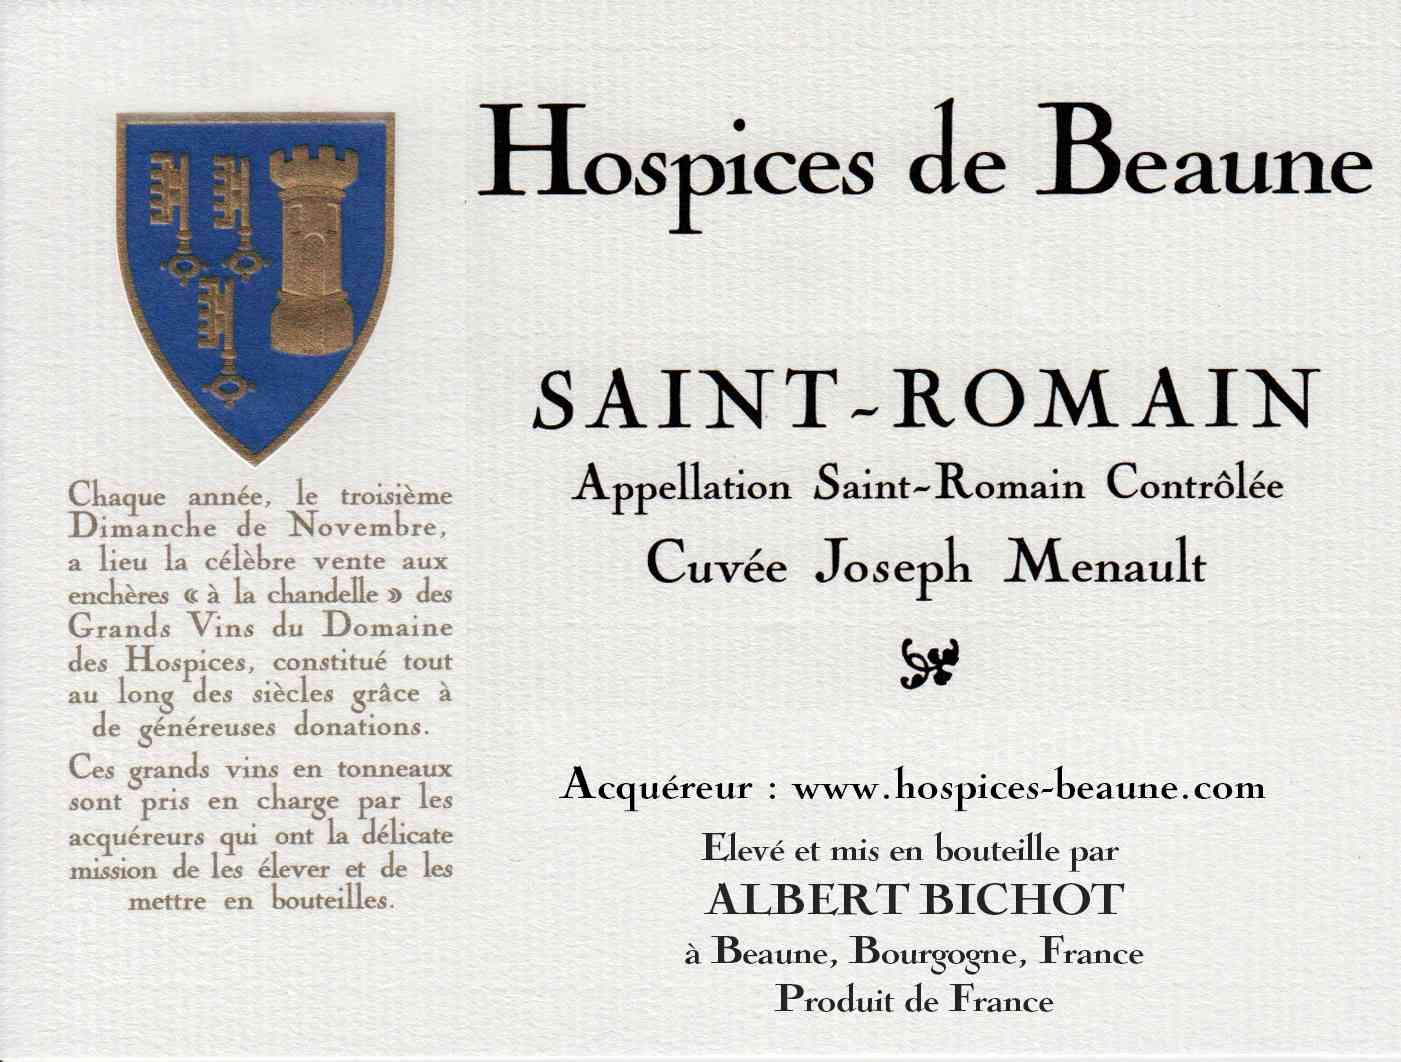 Encheres-auction-HospicesdeBeaune-AlbertBichot-SaintRomainPremierCru-Cuvee-JosephMenault